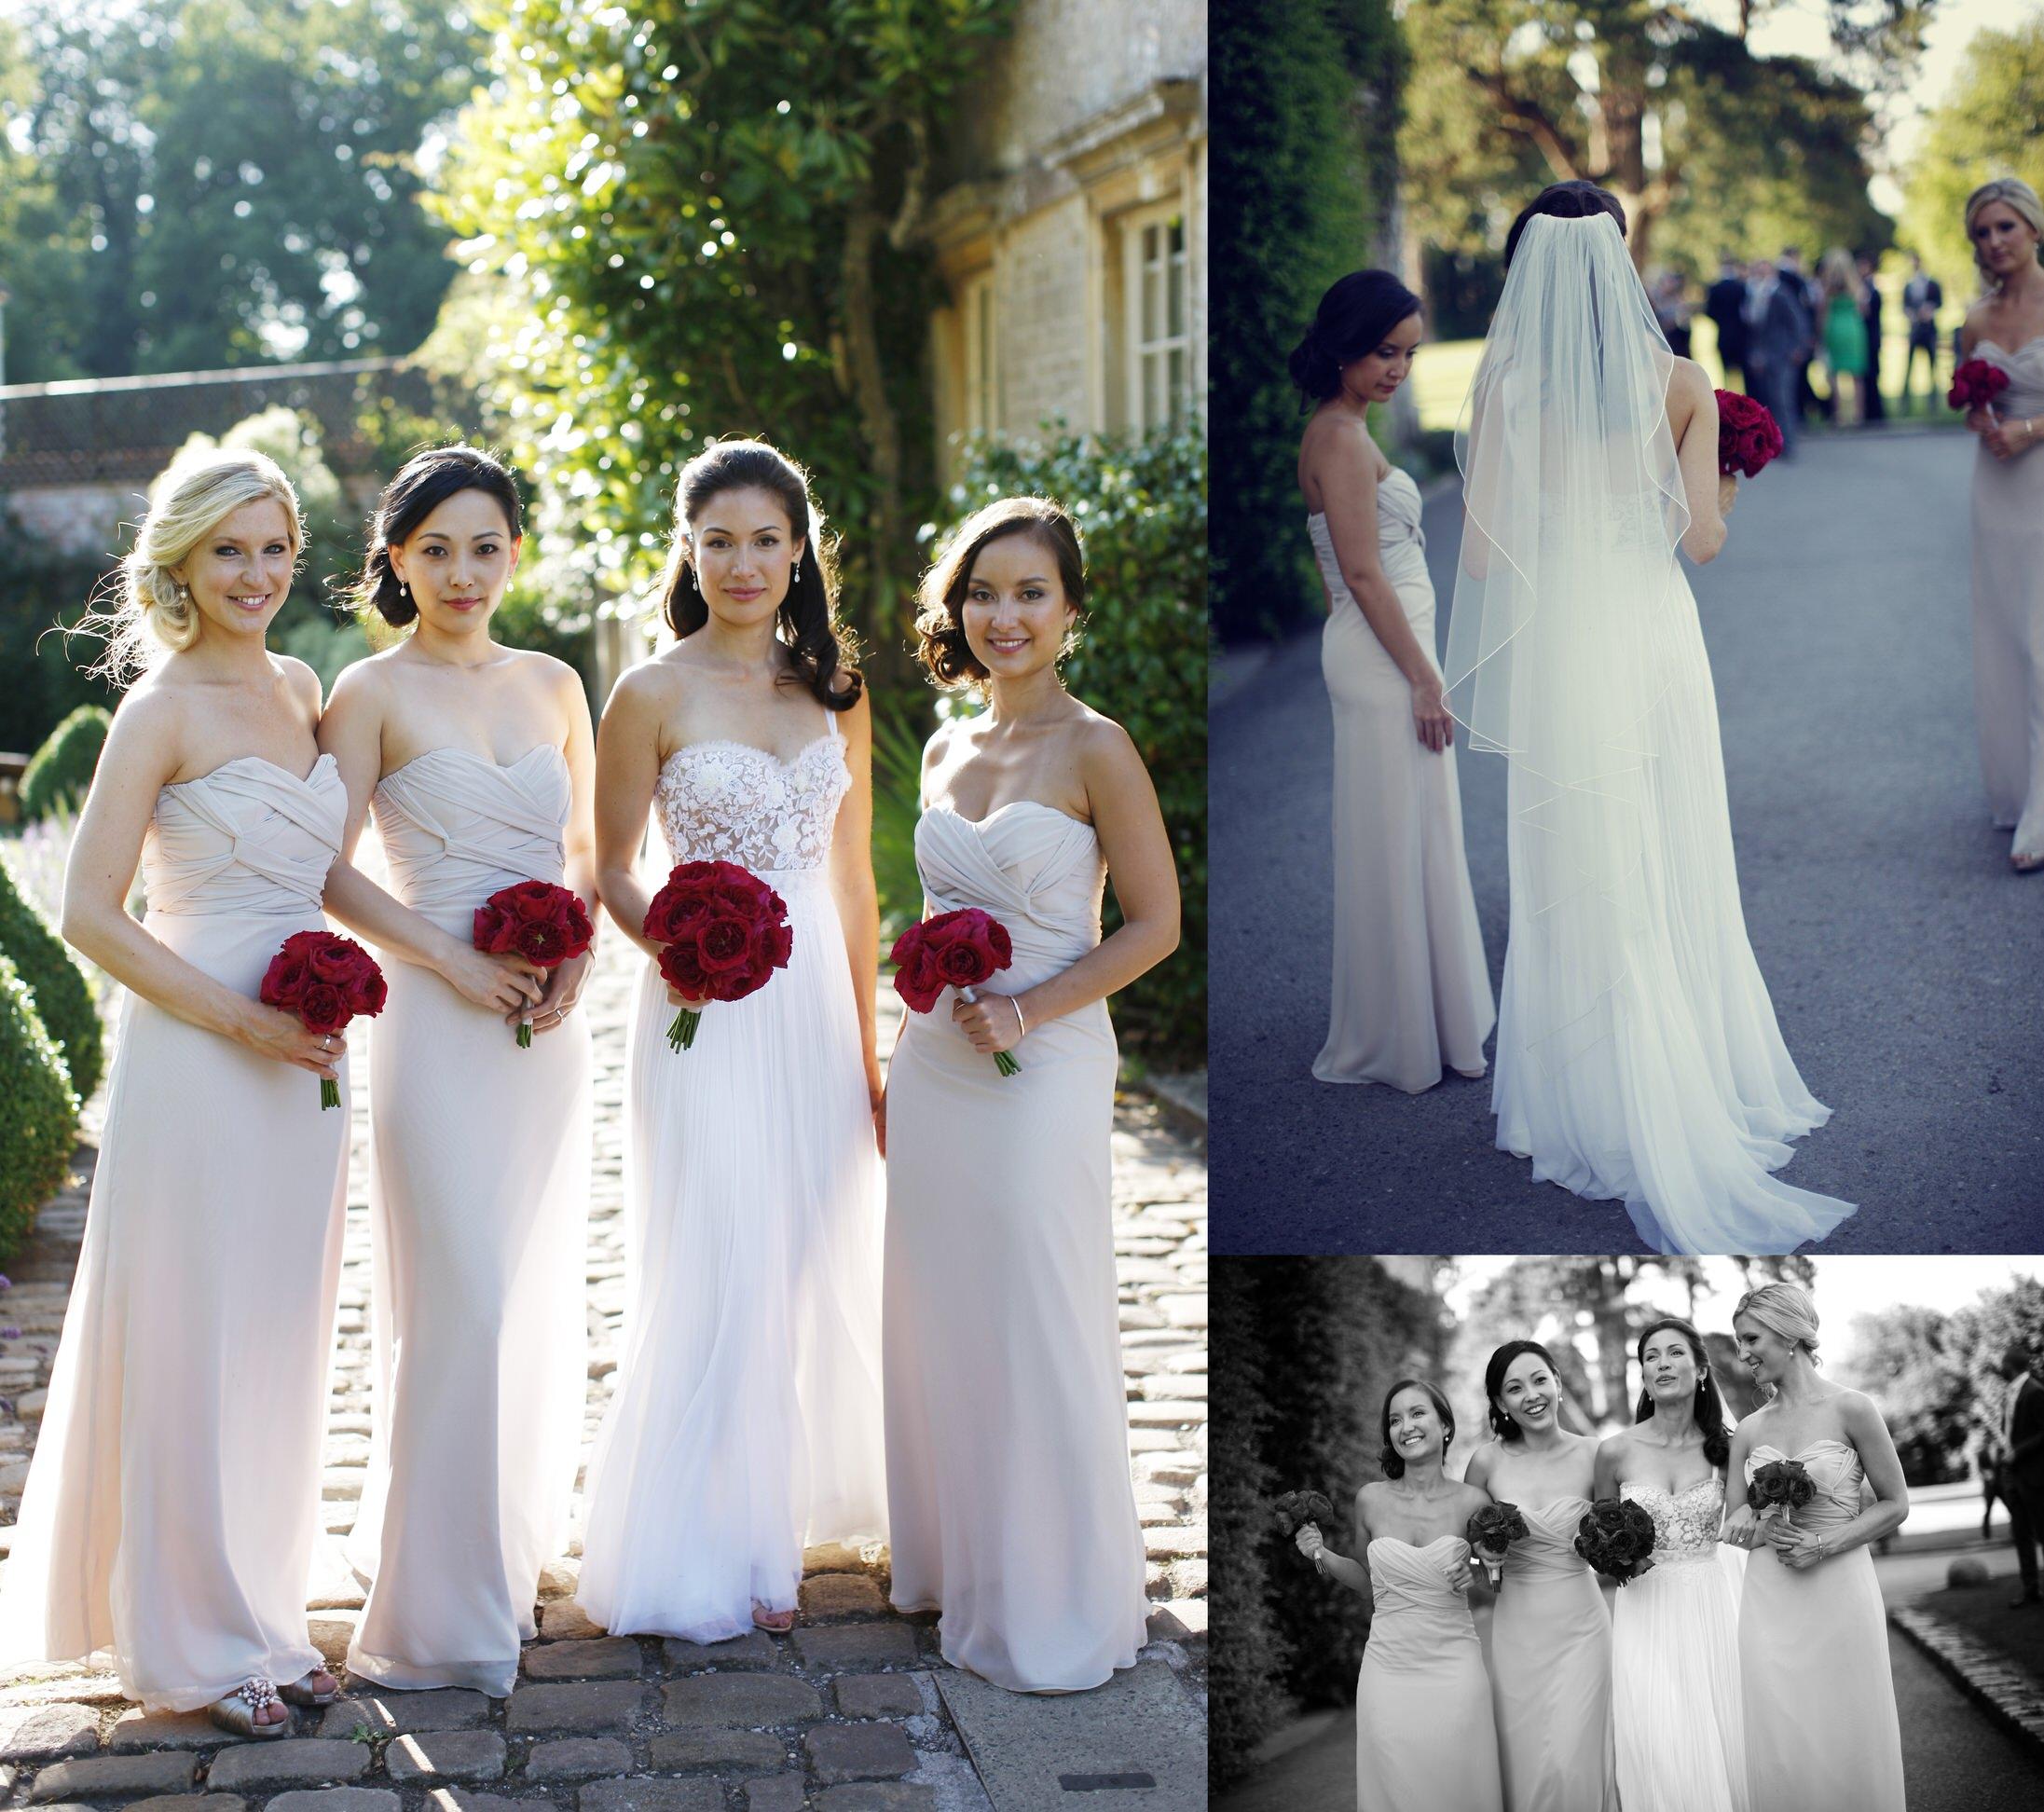 summer-wedding-babington-house-london-weddings_0020.jpg